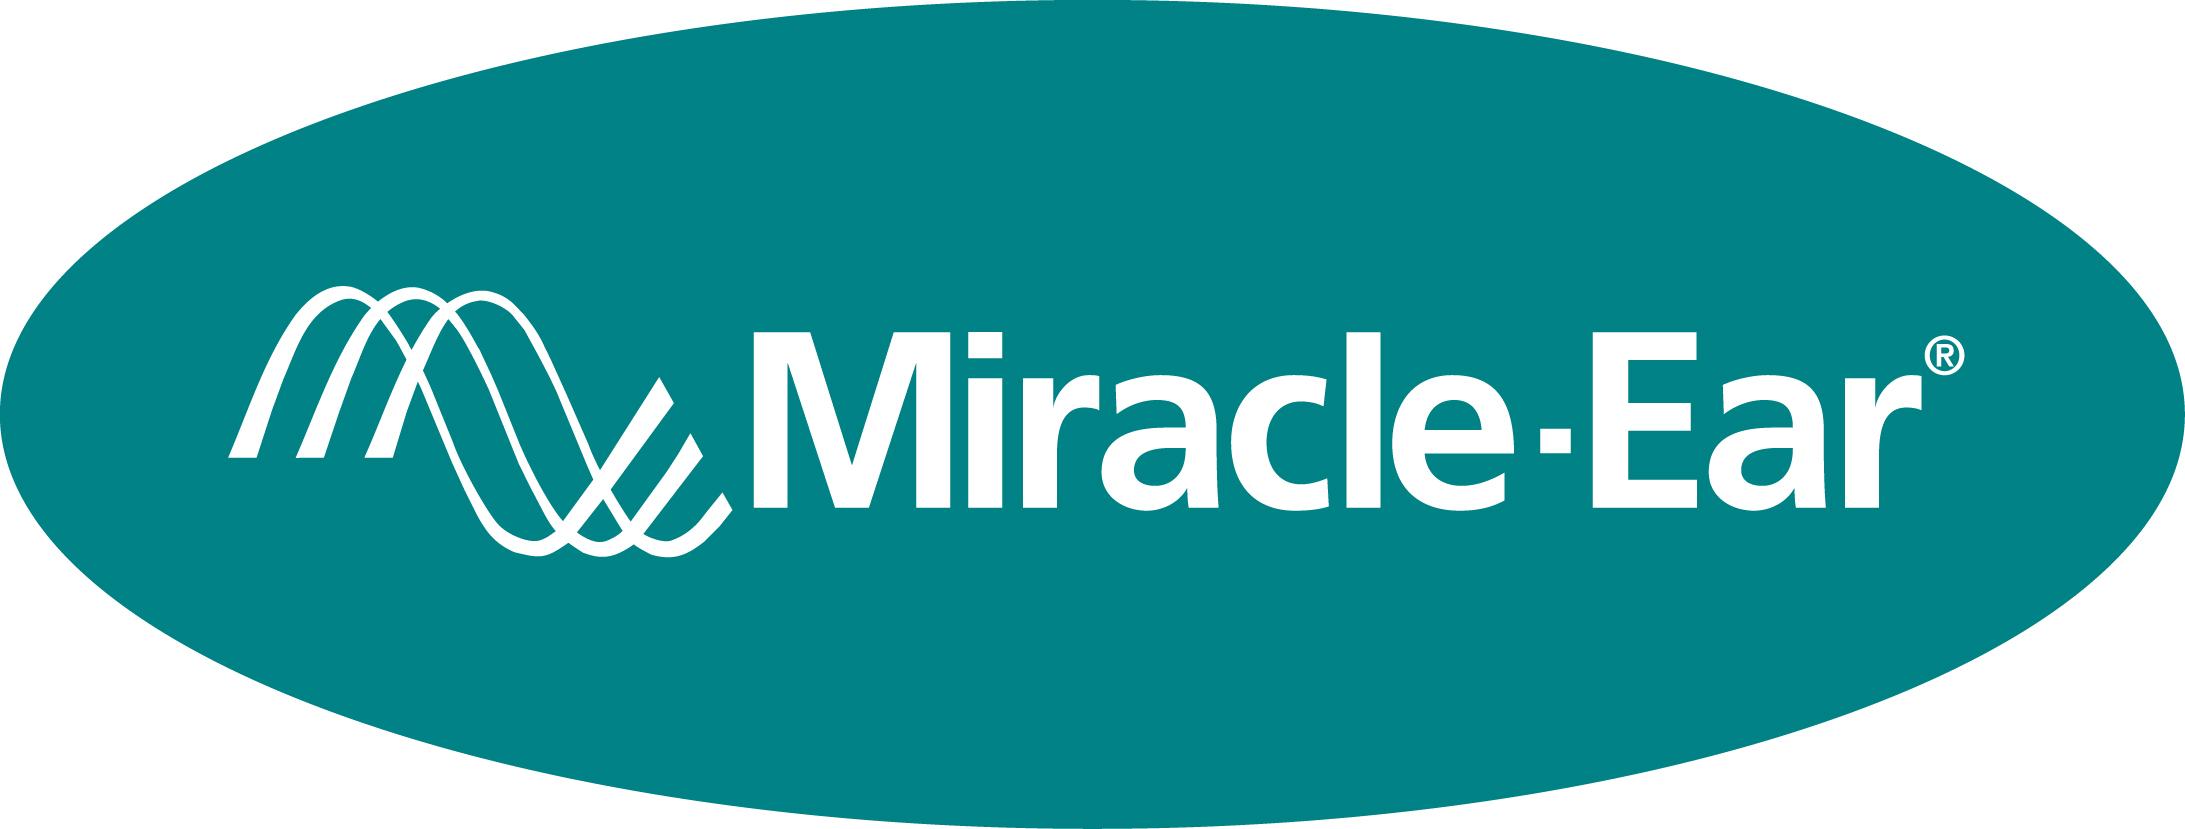 miracle ear.jpg